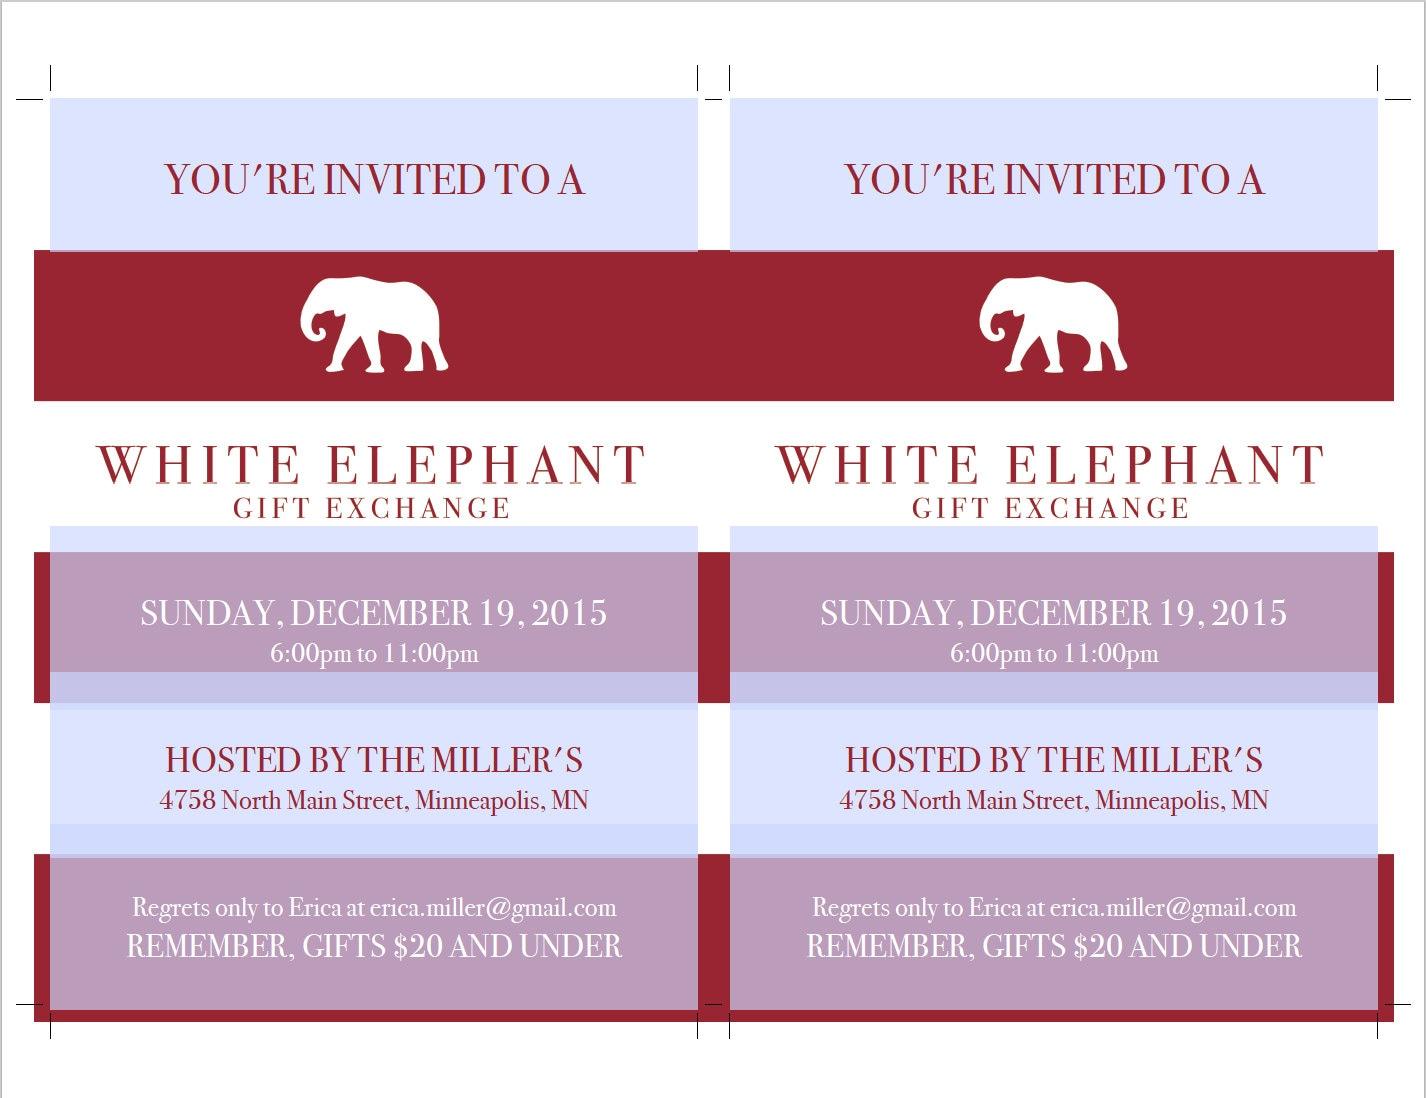 White elephant invitation template diy printable white elephant white elephant invitation template diy printable white elephant gift exchange white elephant gift edit yourself and print solutioingenieria Images